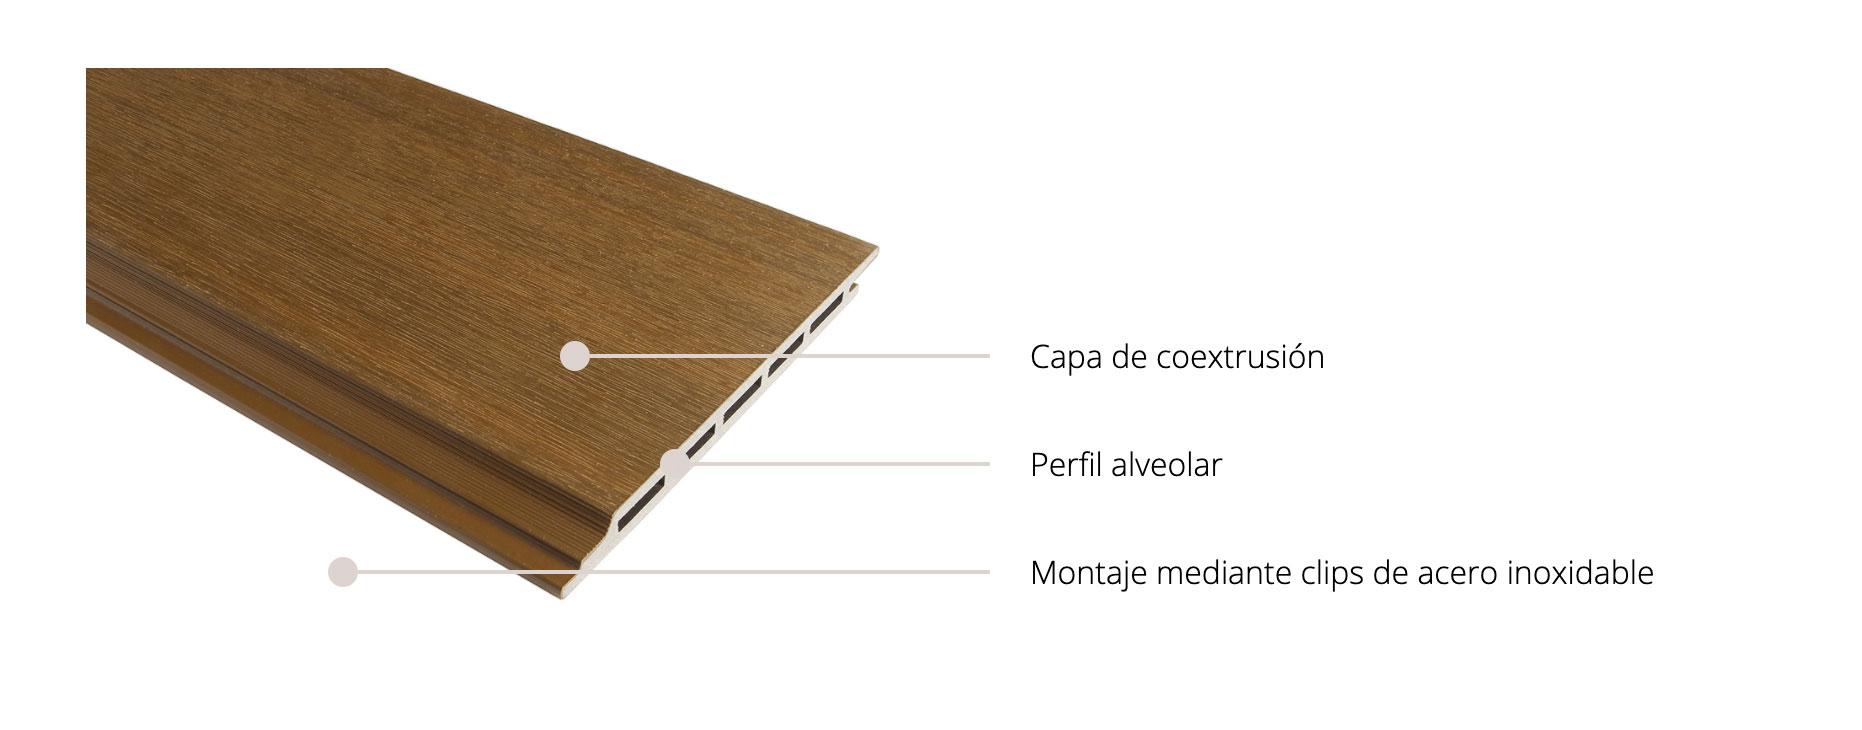 madera tecnica weo classic